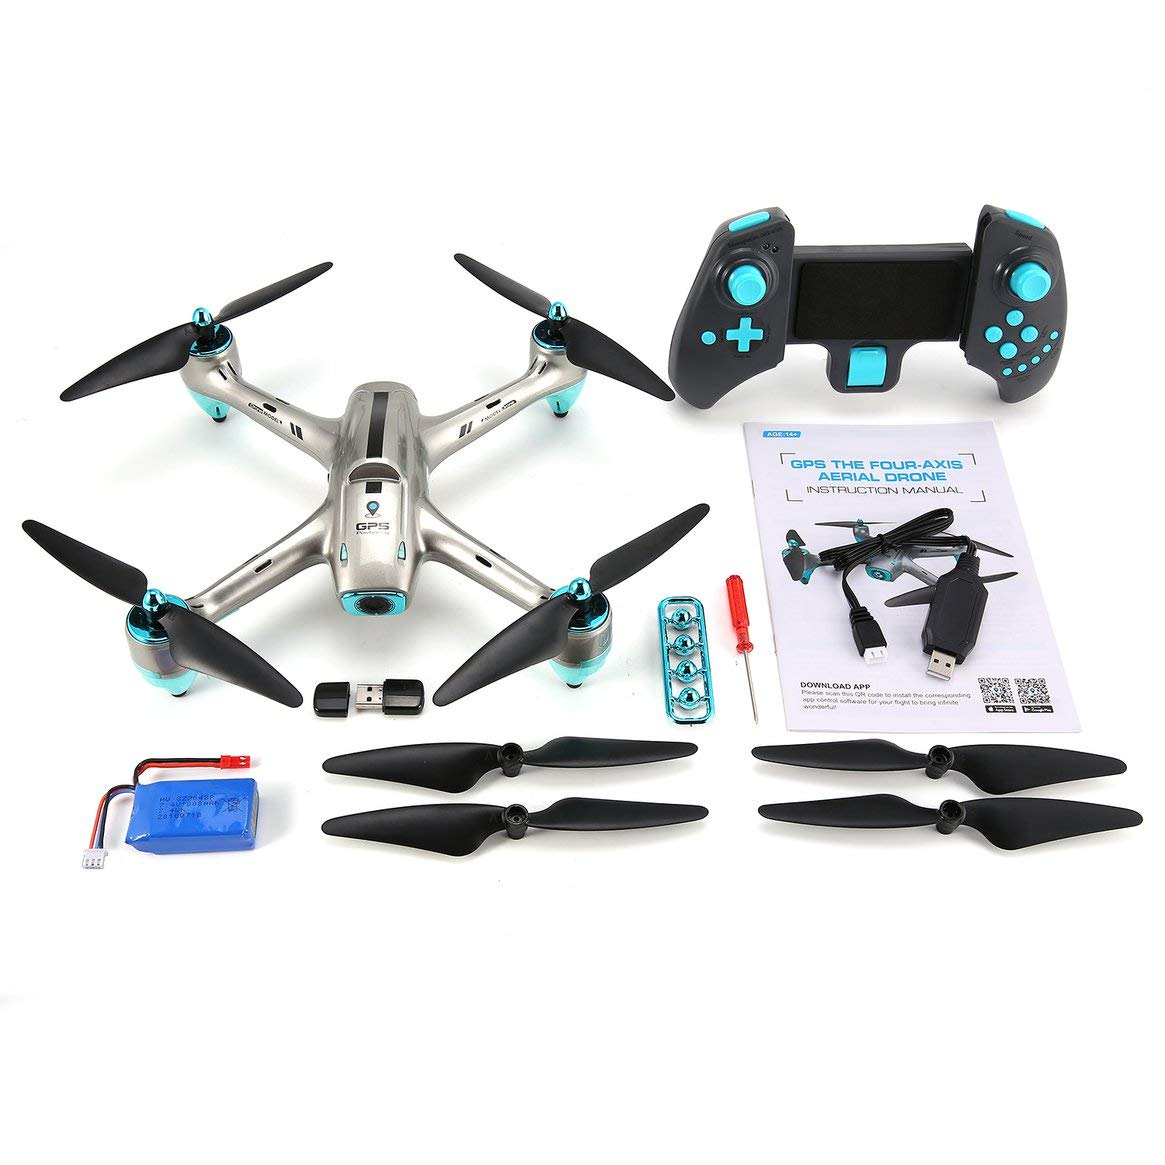 Delicacydex 6957G 2.4G GPS Positionierung 720 P HD Weitwinkel Kamera FPV RC Drone Quadcopter Echtzeit Follow Me One Key Return 360 ° Flips - Silber